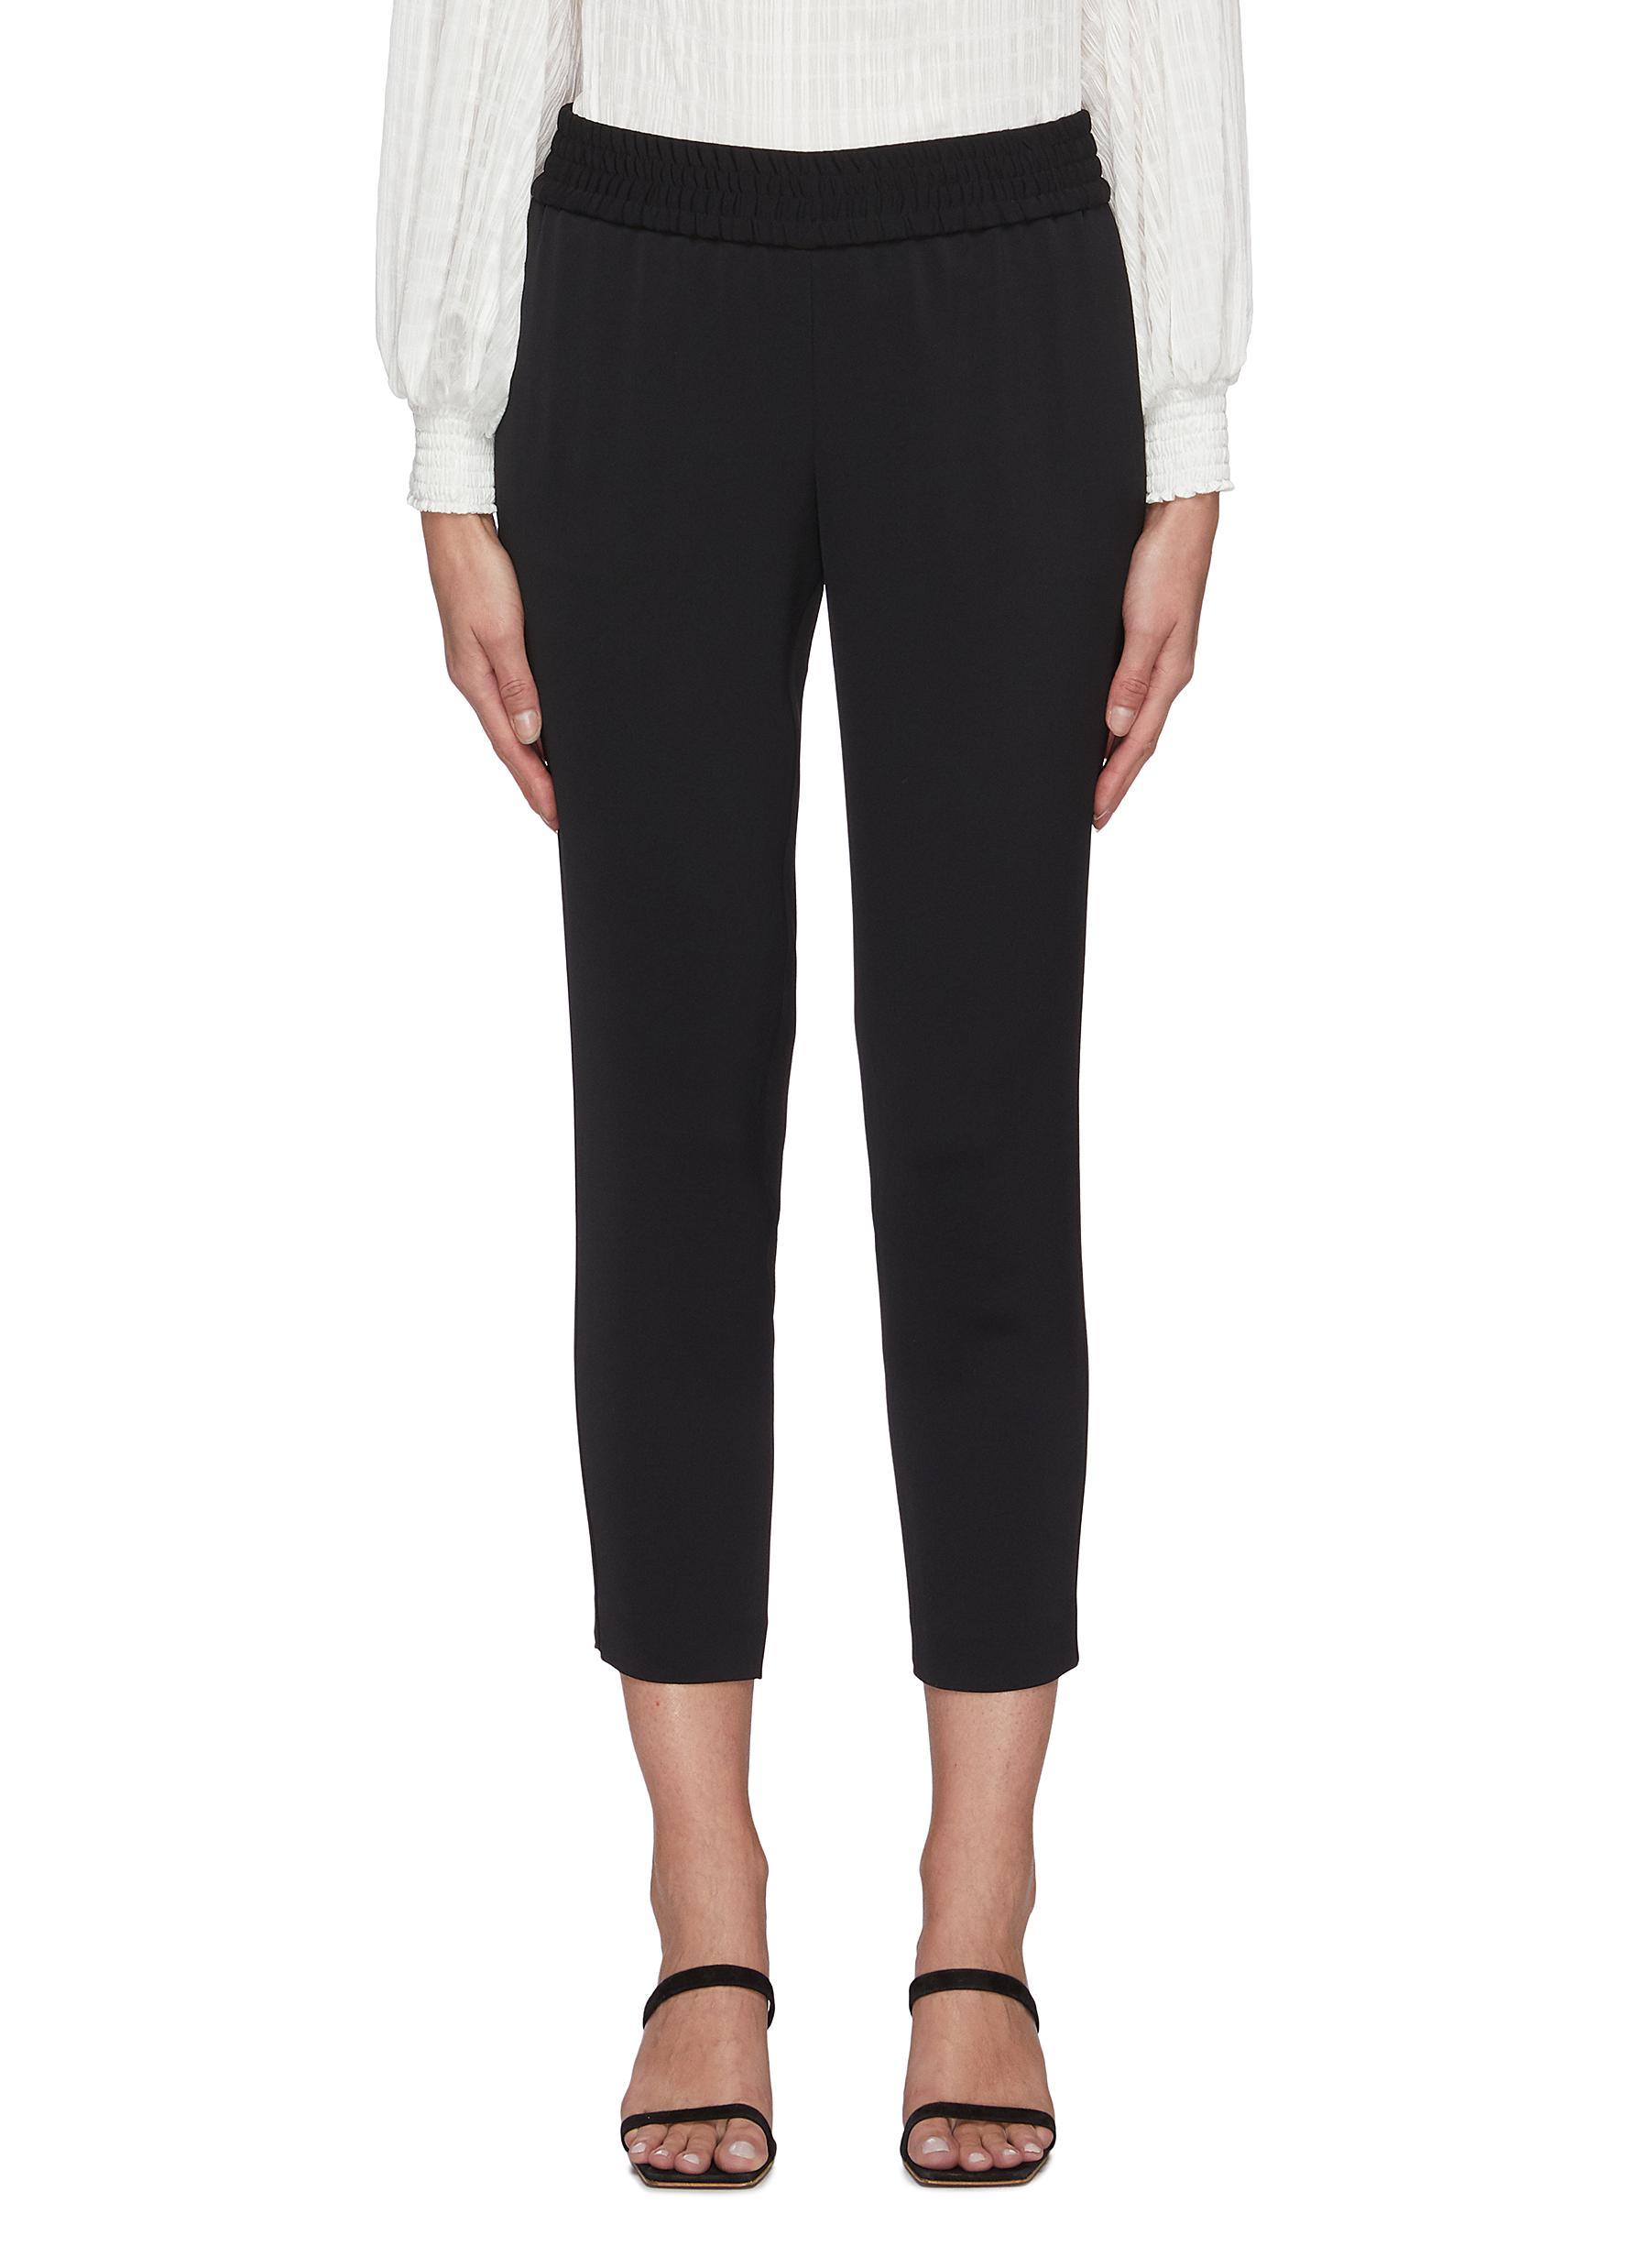 CLASSIC BENNY' Tapered Leg Pants - ALICE + OLIVIA - Modalova